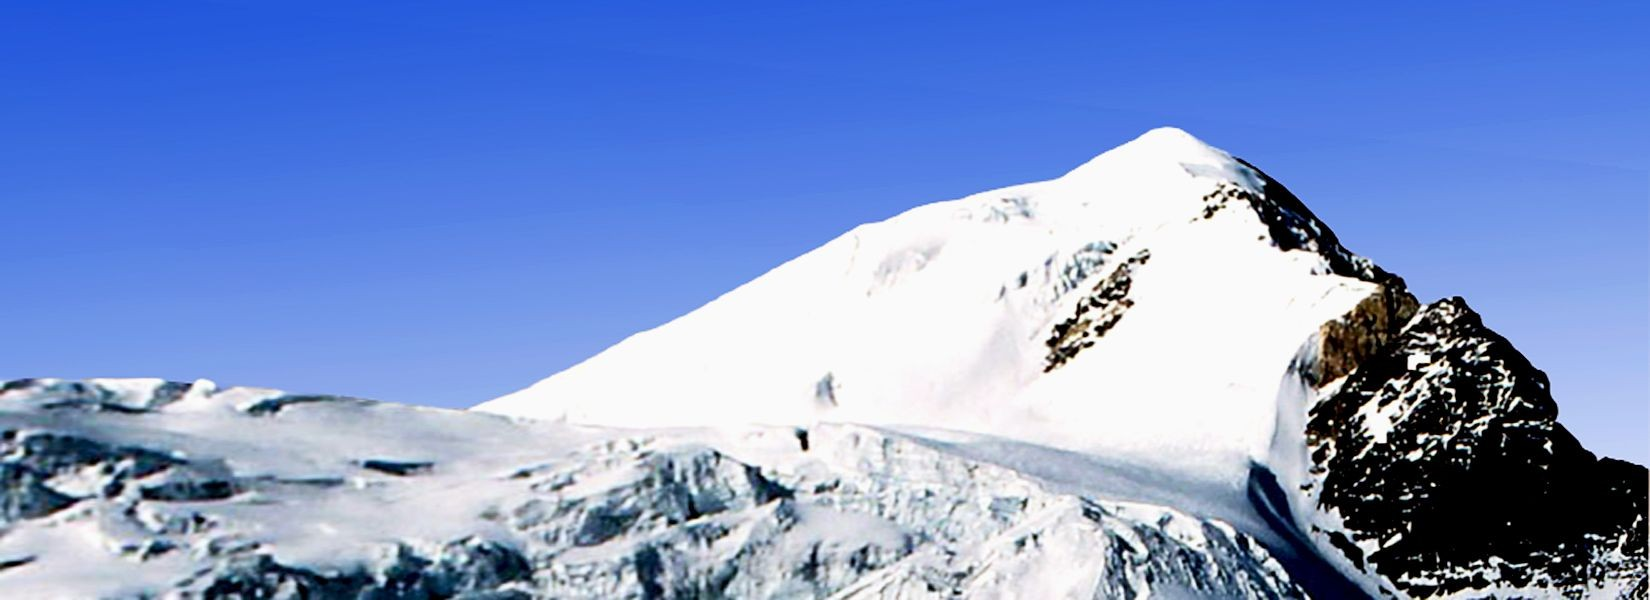 Chulu West, Chulu West Peak, Chulu West Peak Nepal, Chulu West Nepal